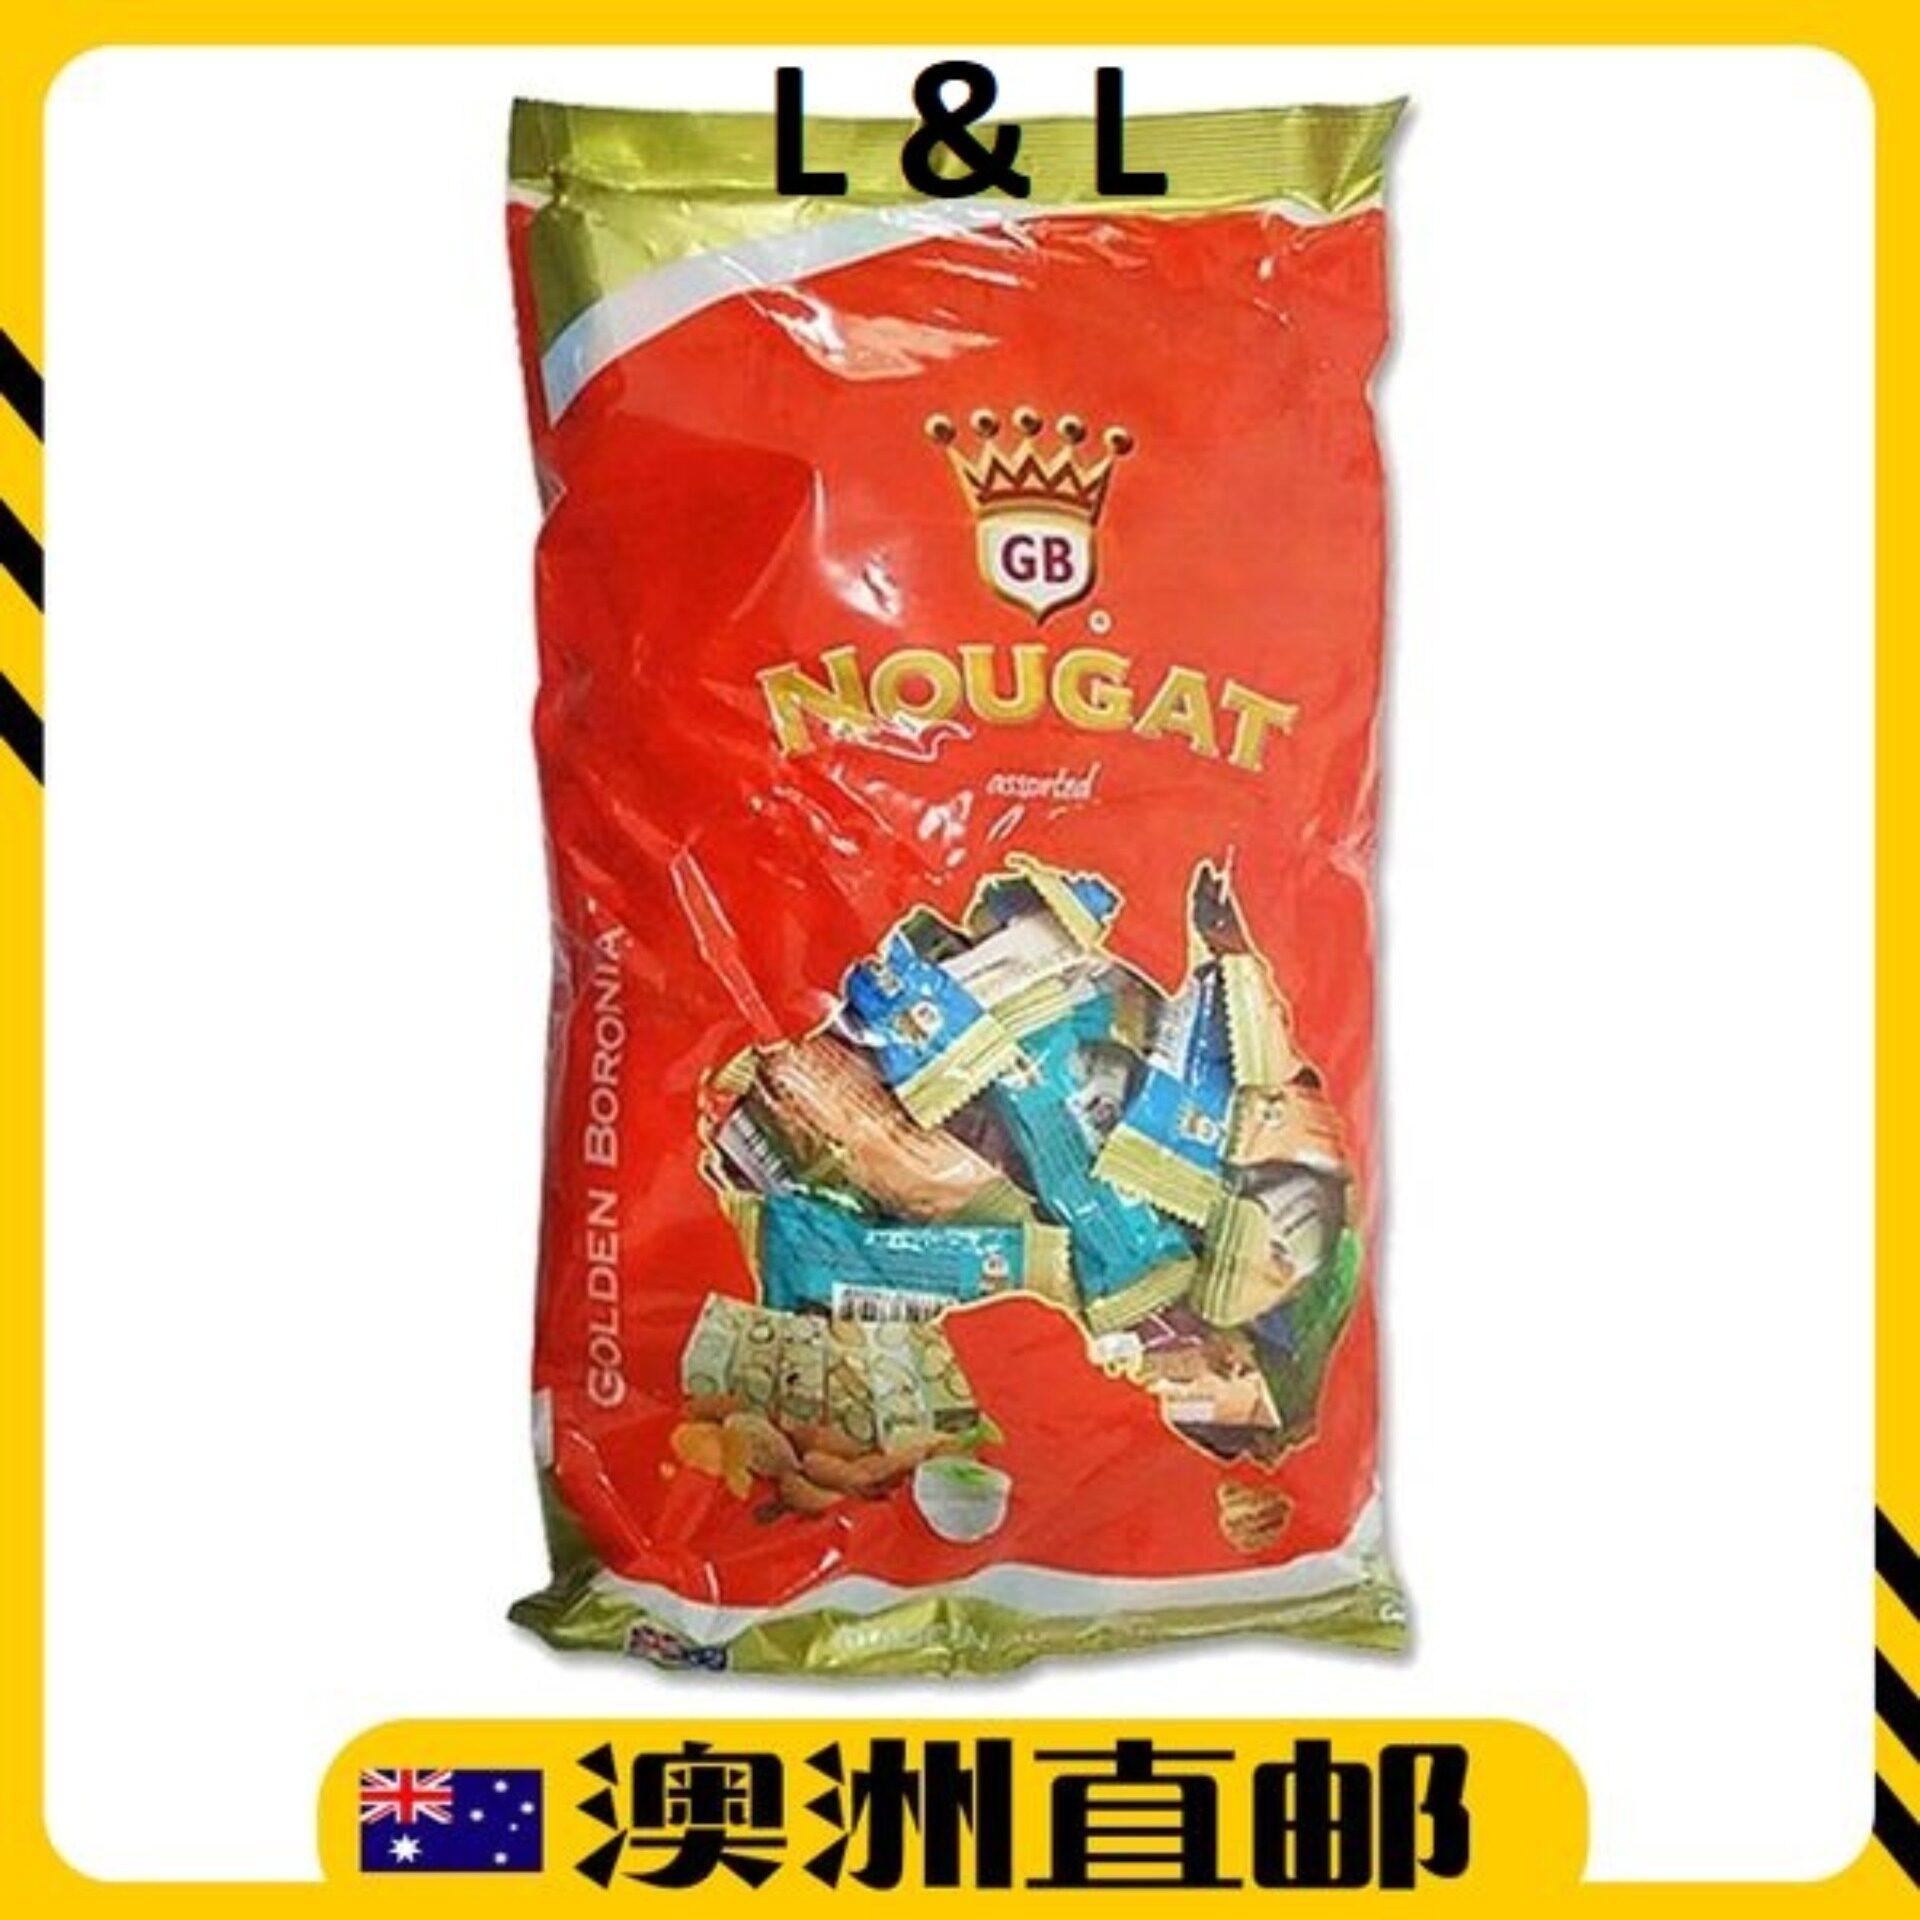 [Pre Order] Australia Import Golden Boronia Nougat Assorted 1KG (Made in Australia)